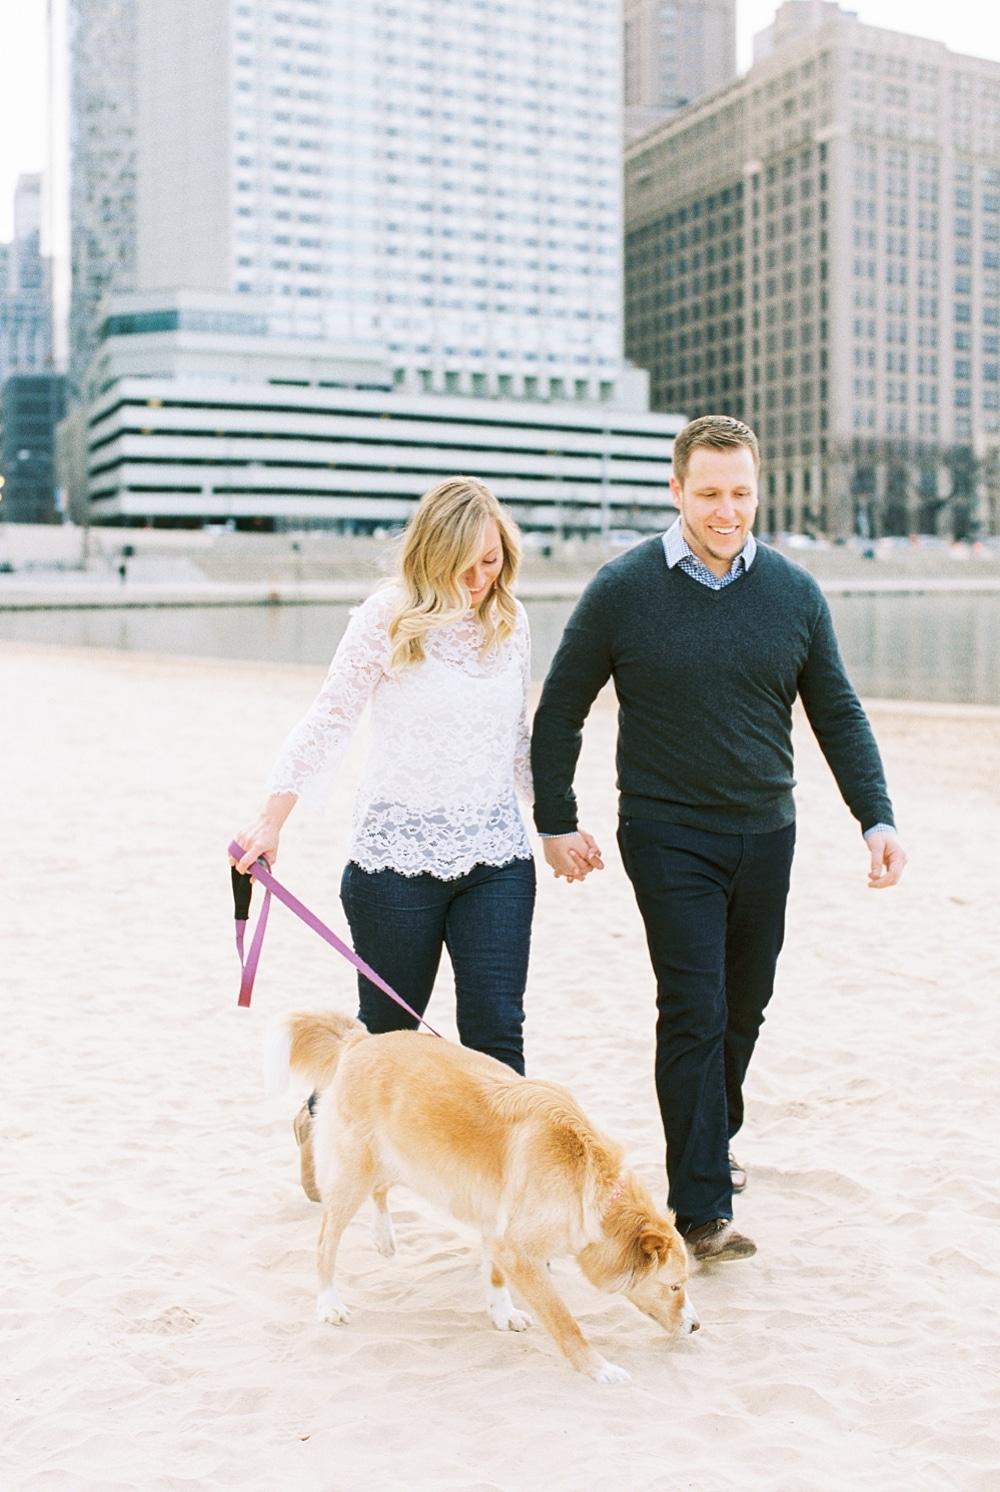 Kristin-La-Voie-Photography-Chicago-Wedding-Photographer-51